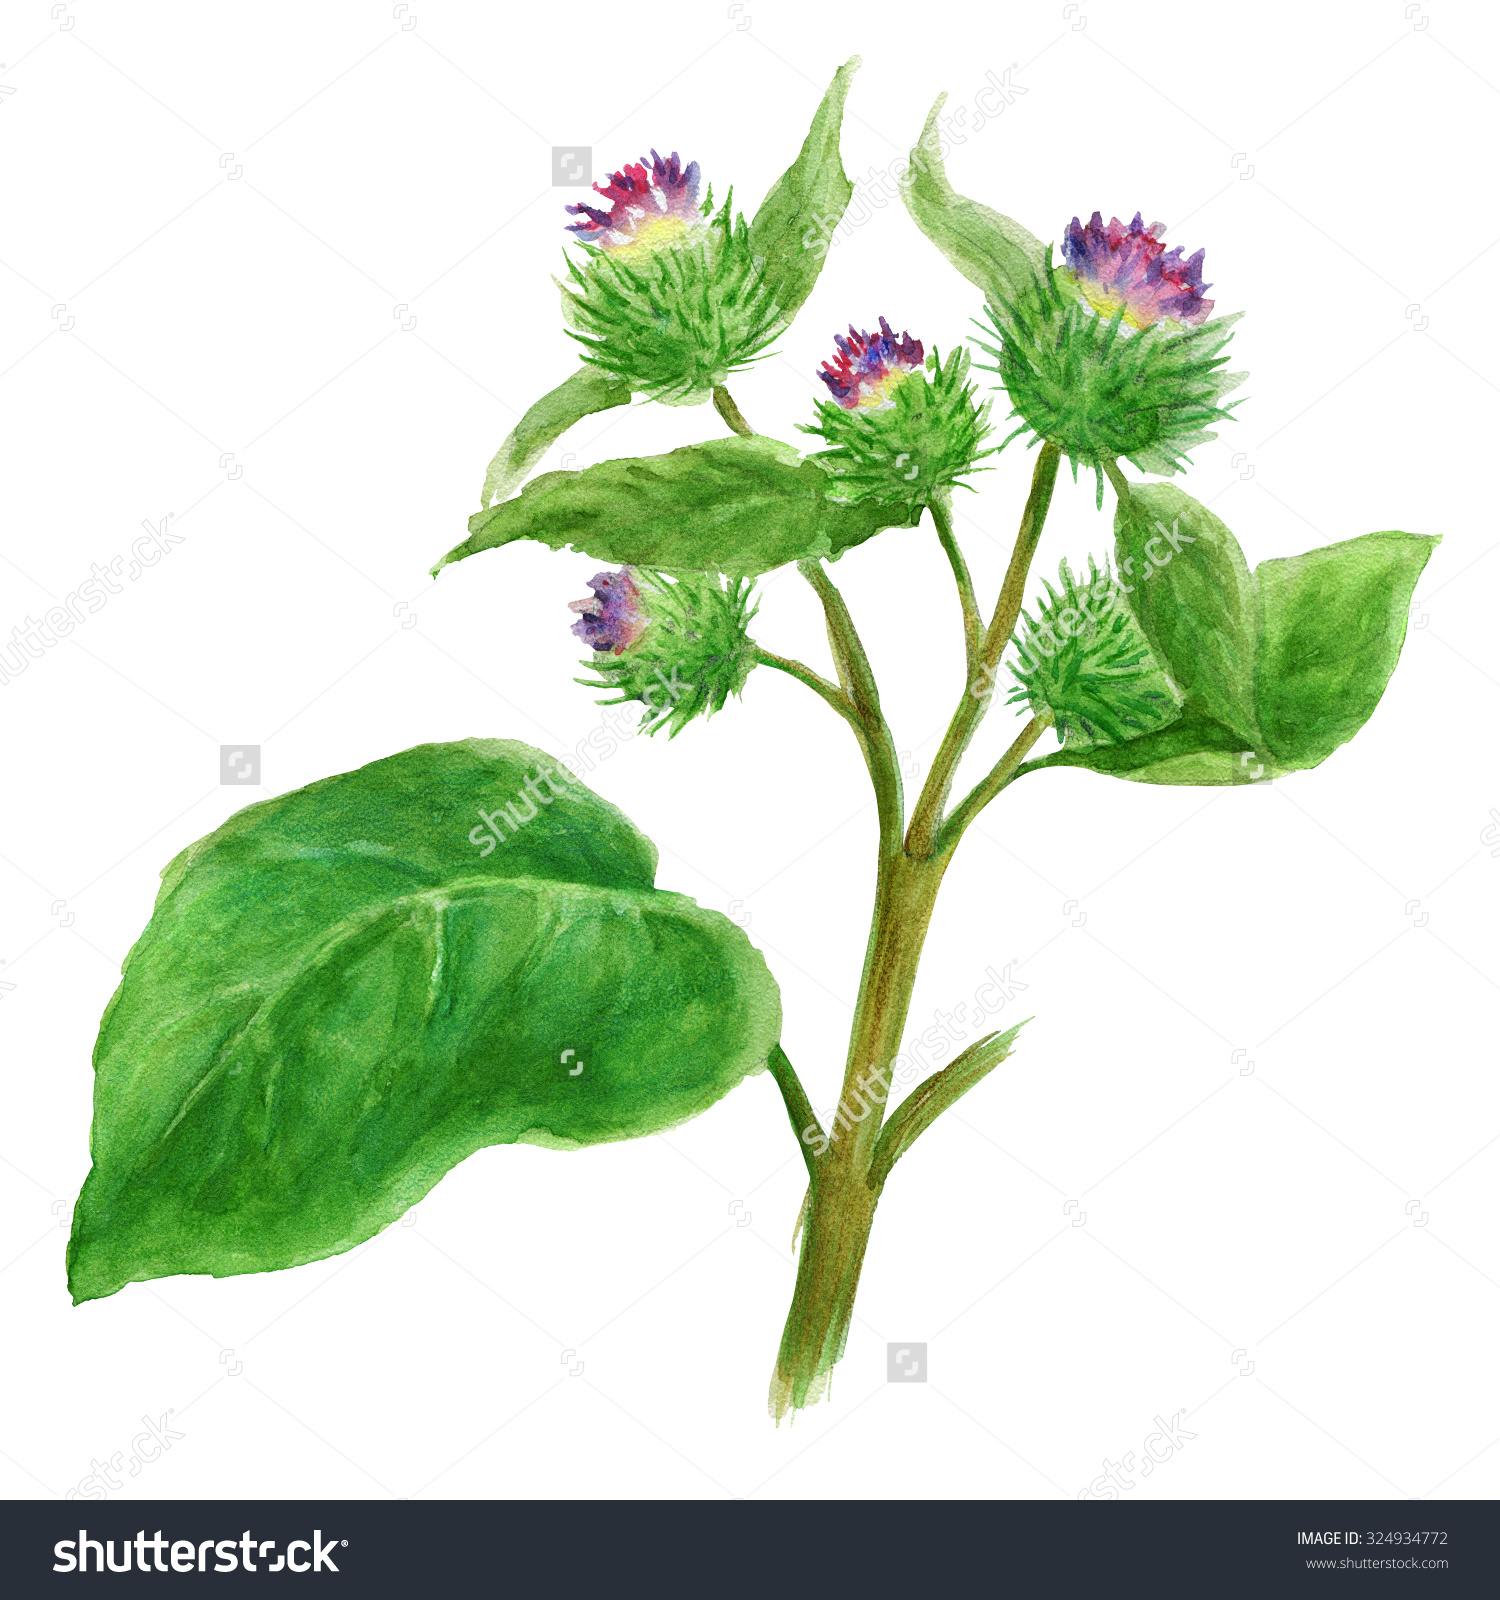 Watercolor Botanical Illustration Burdock Medicinal Plant Stock.